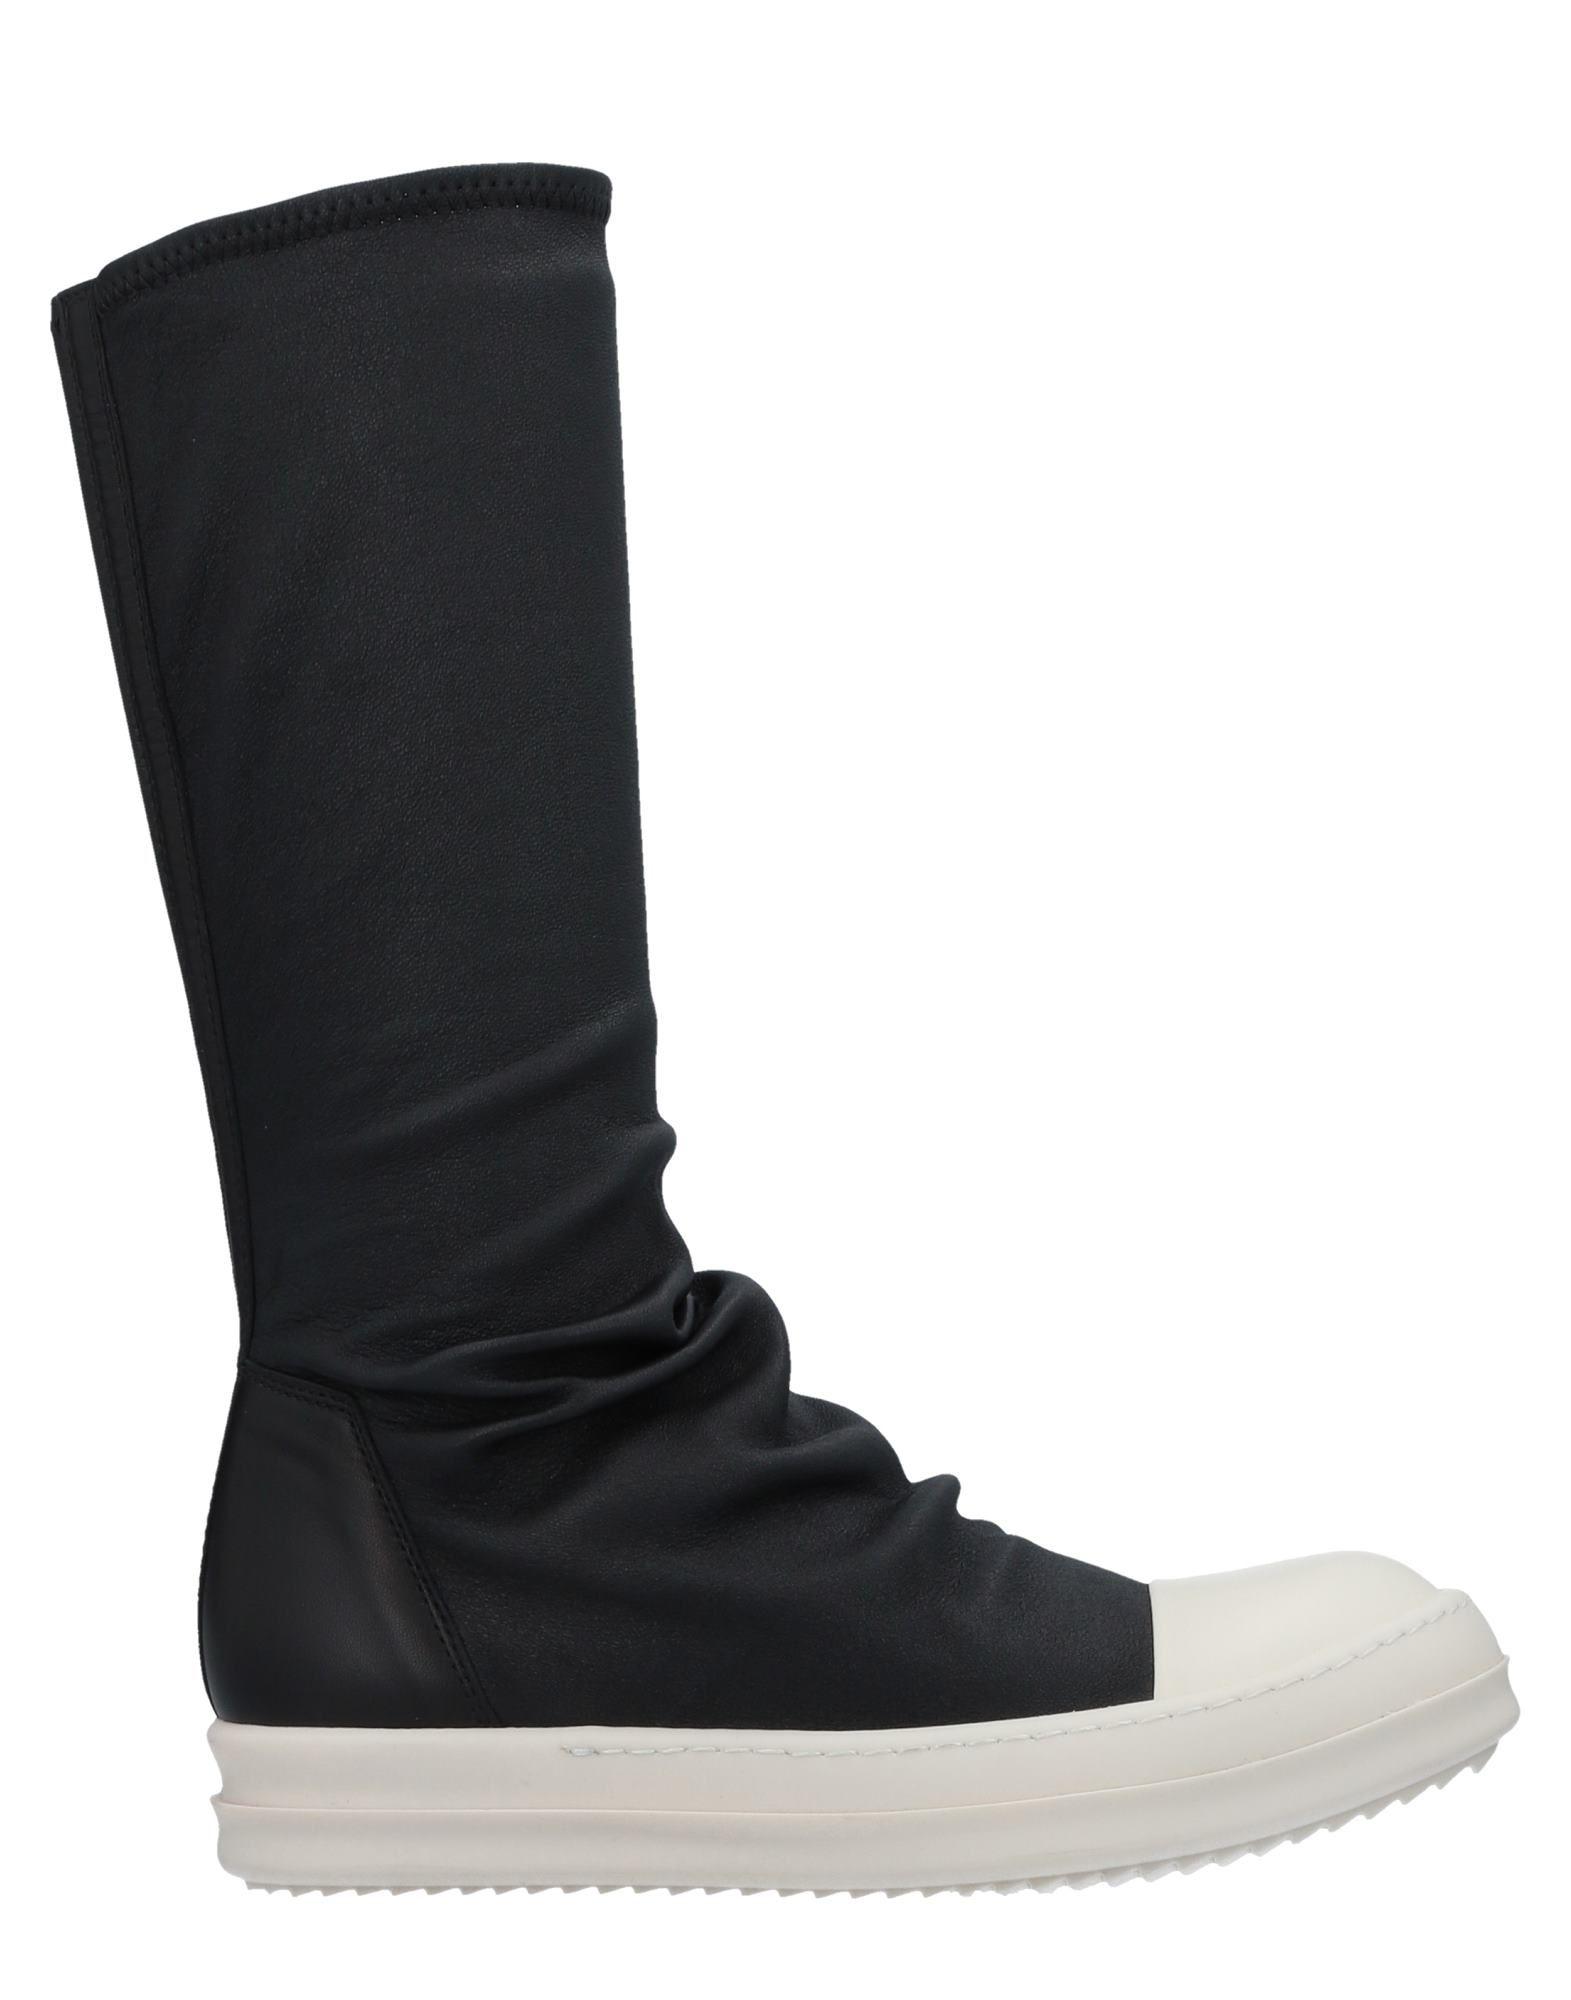 Rick Owens Stiefel Damen  11513272LL Beliebte Schuhe